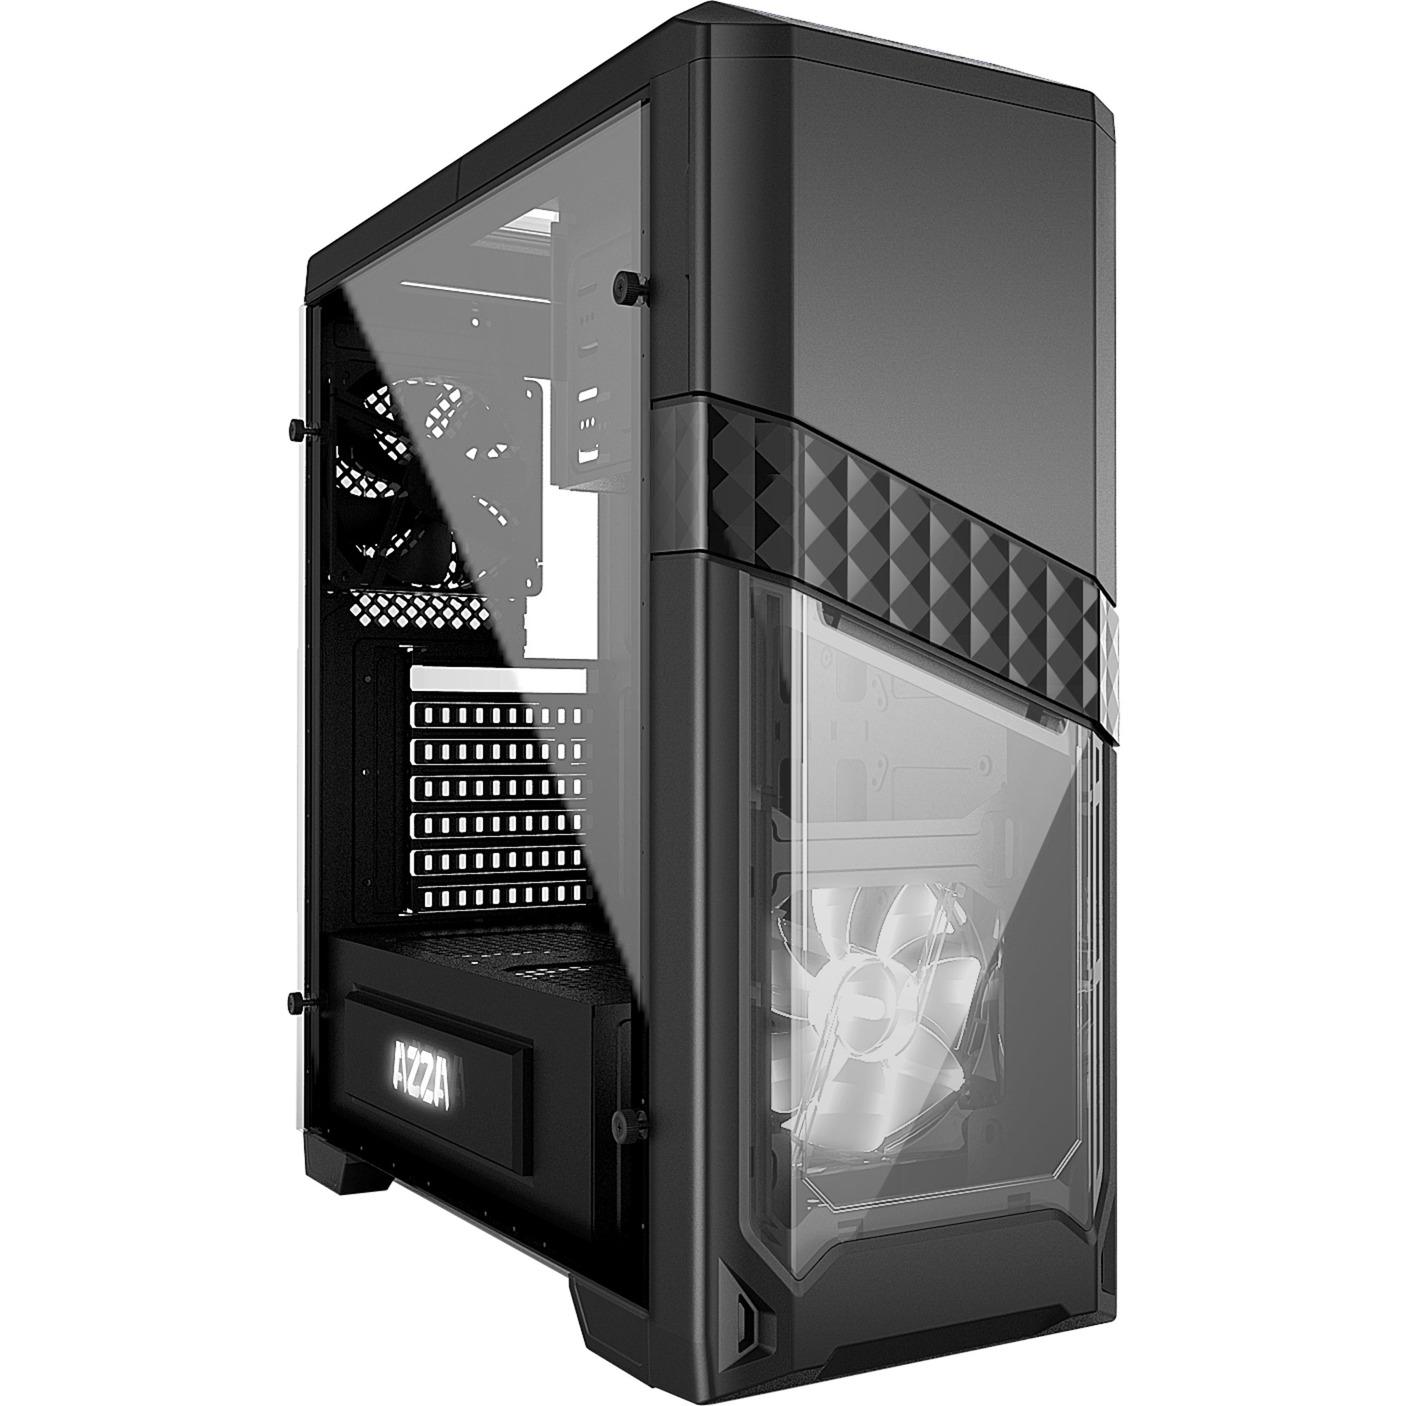 CSAZ-240X Midi-Tower Negro carcasa de ordenador, Cajas de torre